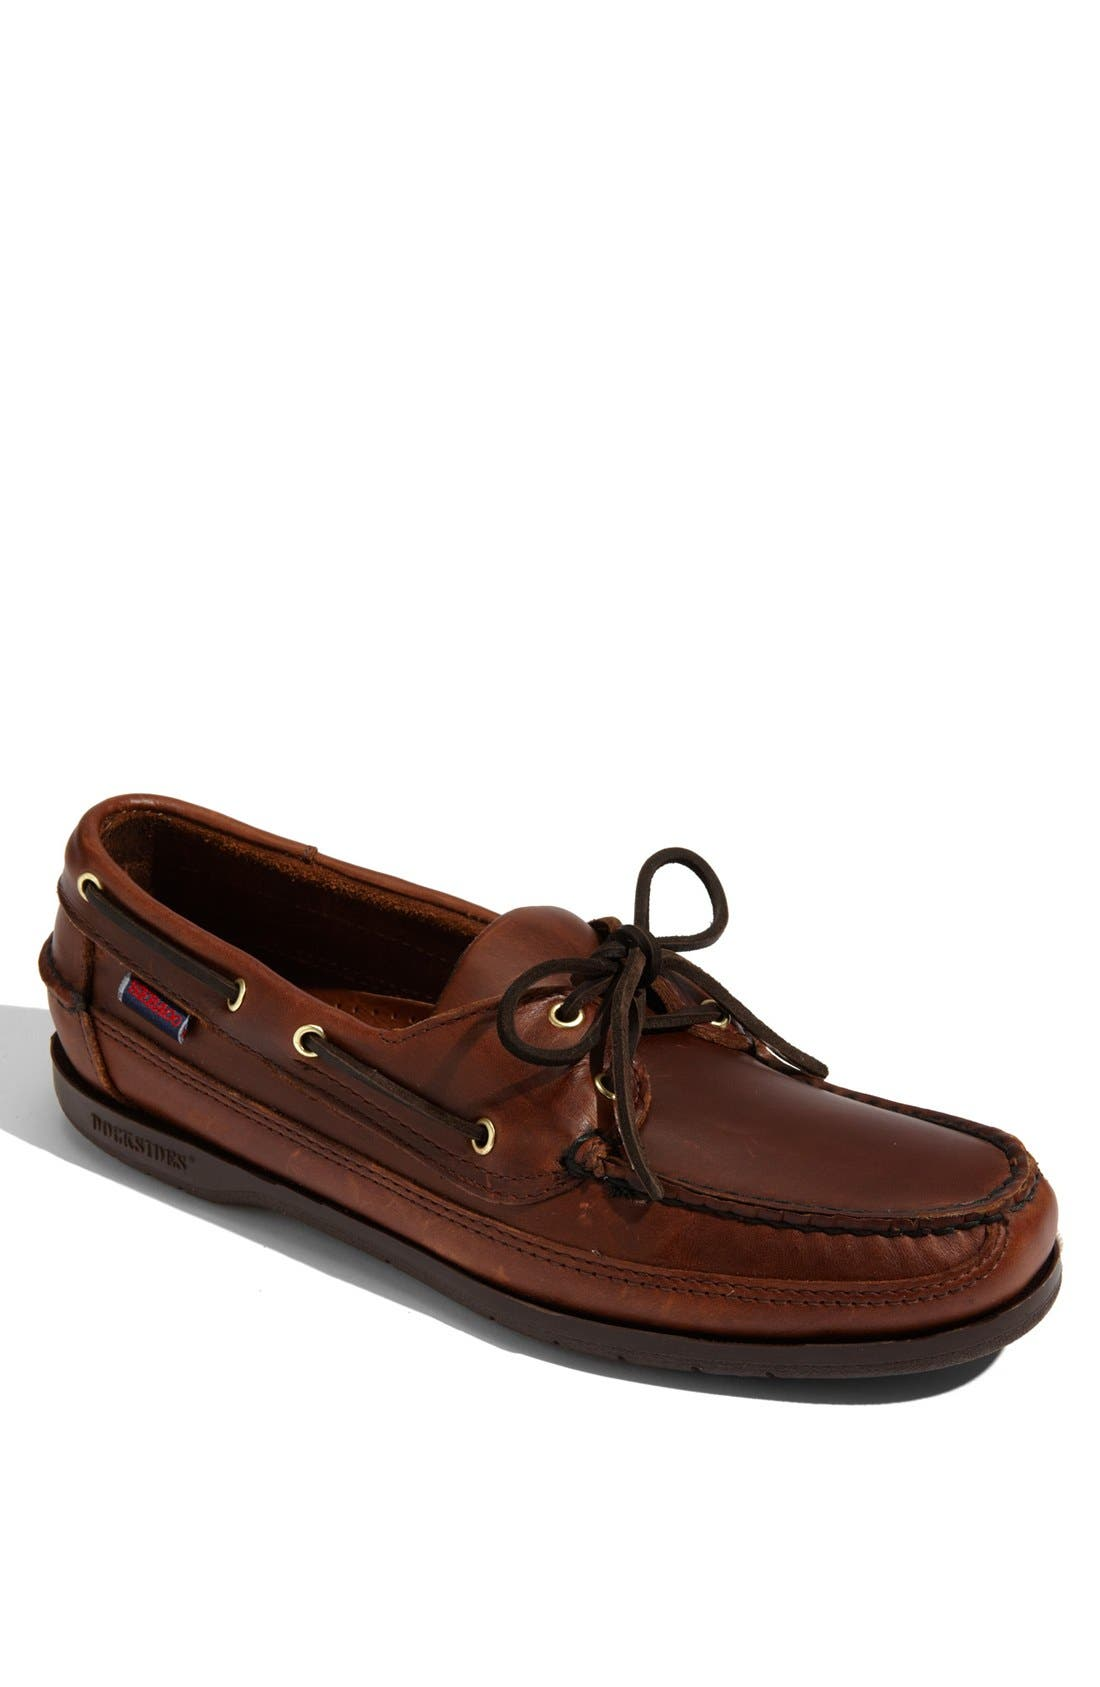 'Schooner' Boat Shoe,                             Main thumbnail 1, color,                             200